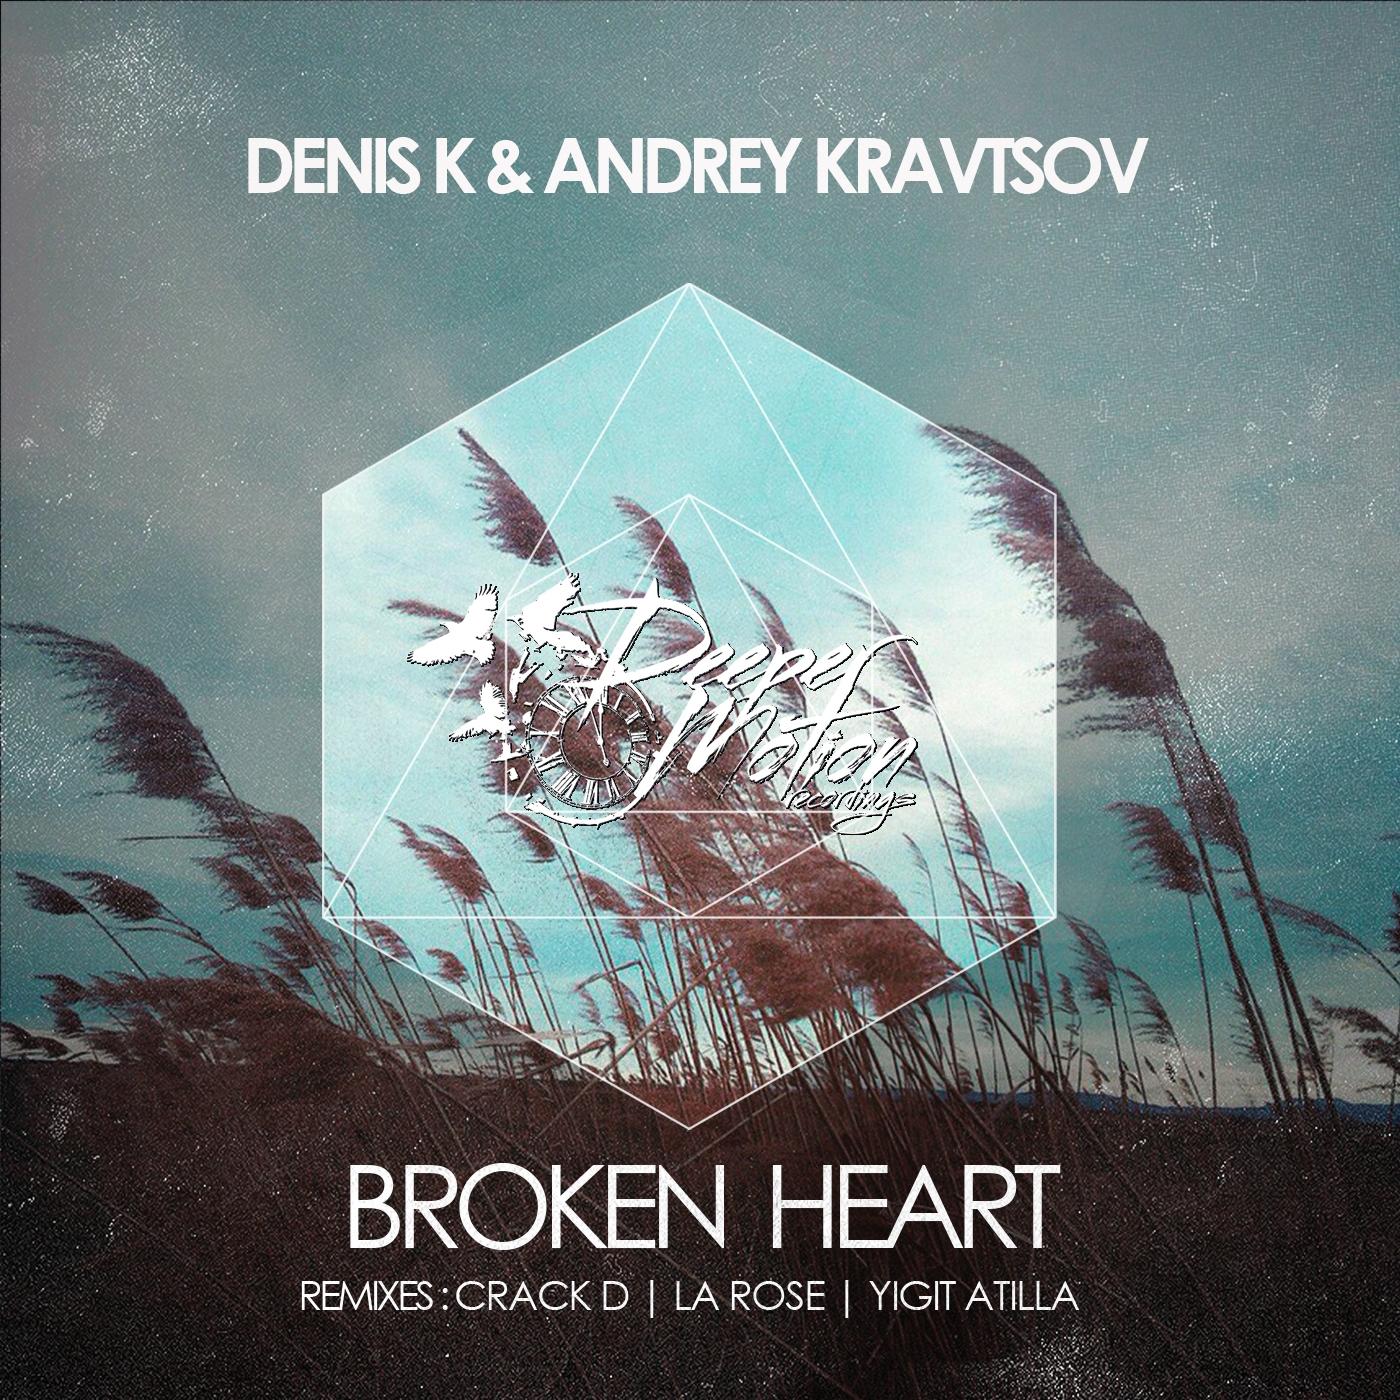 Denis K & Andrey Kravtsov - Broken Heart (Yigit Atilla Remix)